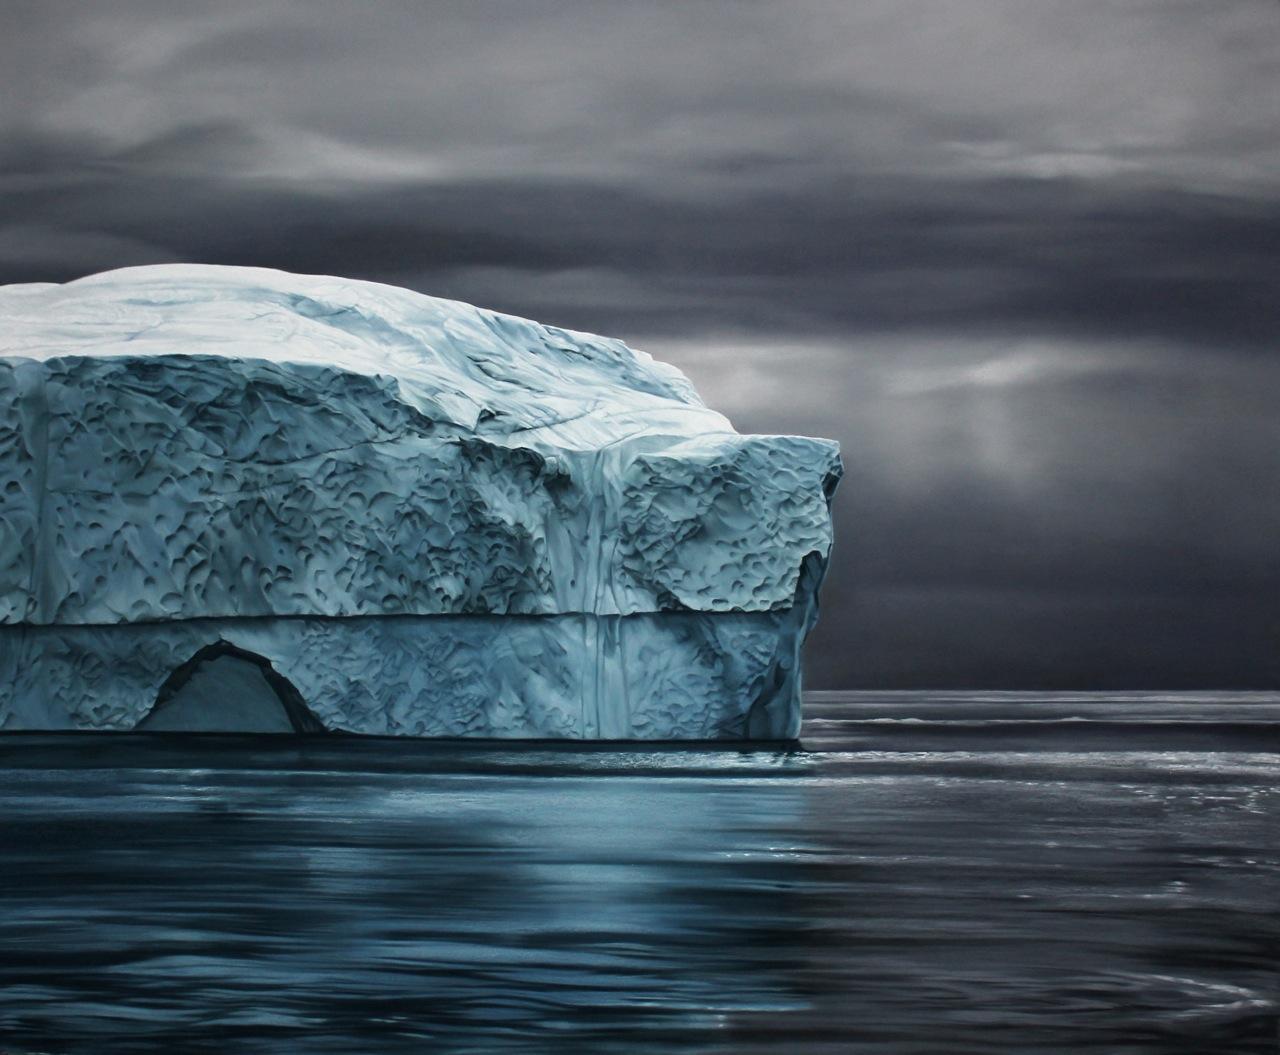 Greenland no.71, 50x60: Image courtesy of Zaria Forman